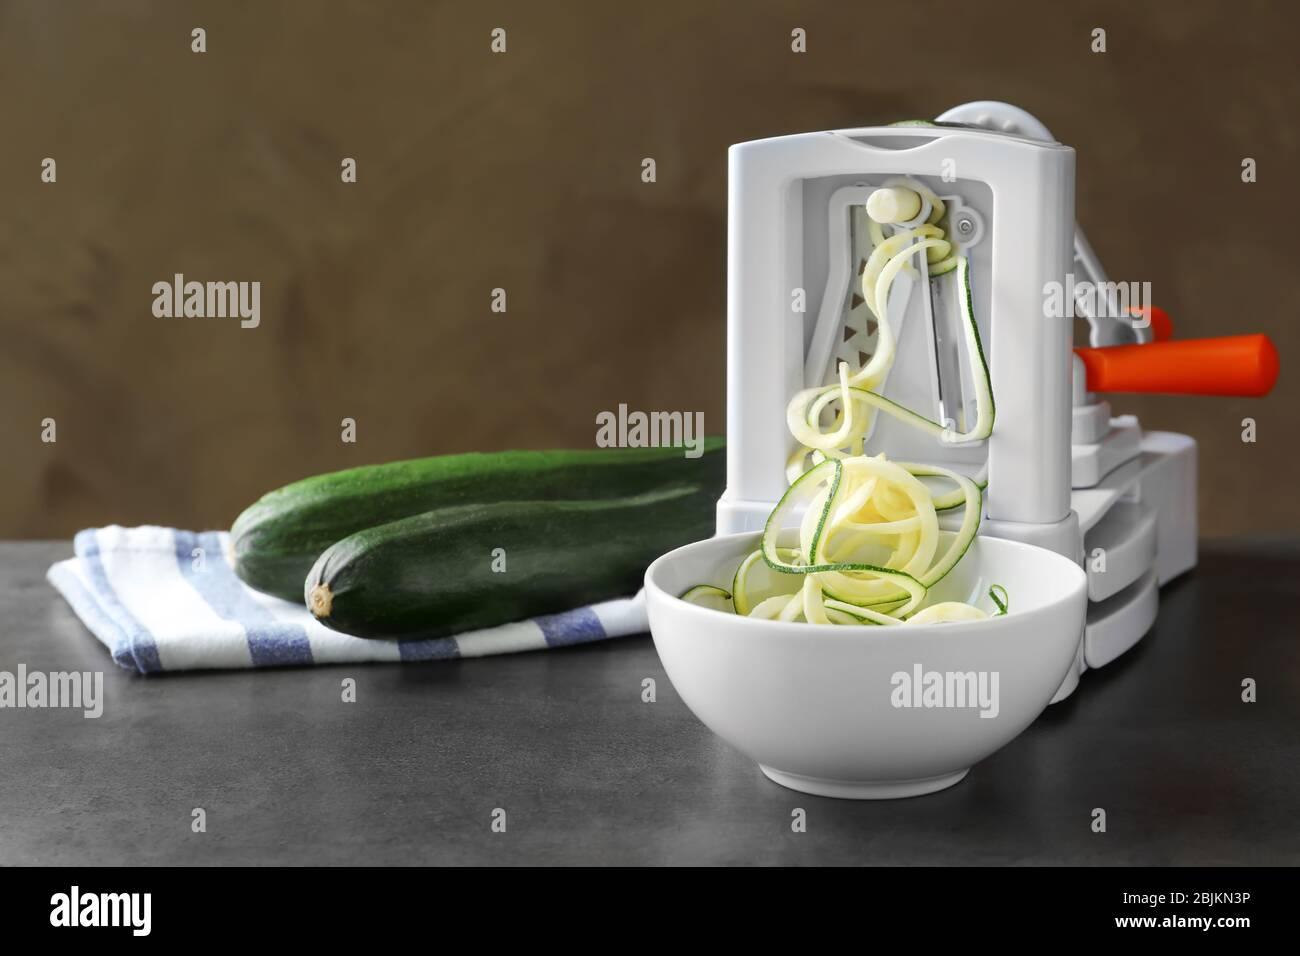 Making spaghetti squash on kitchen table Stock Photo